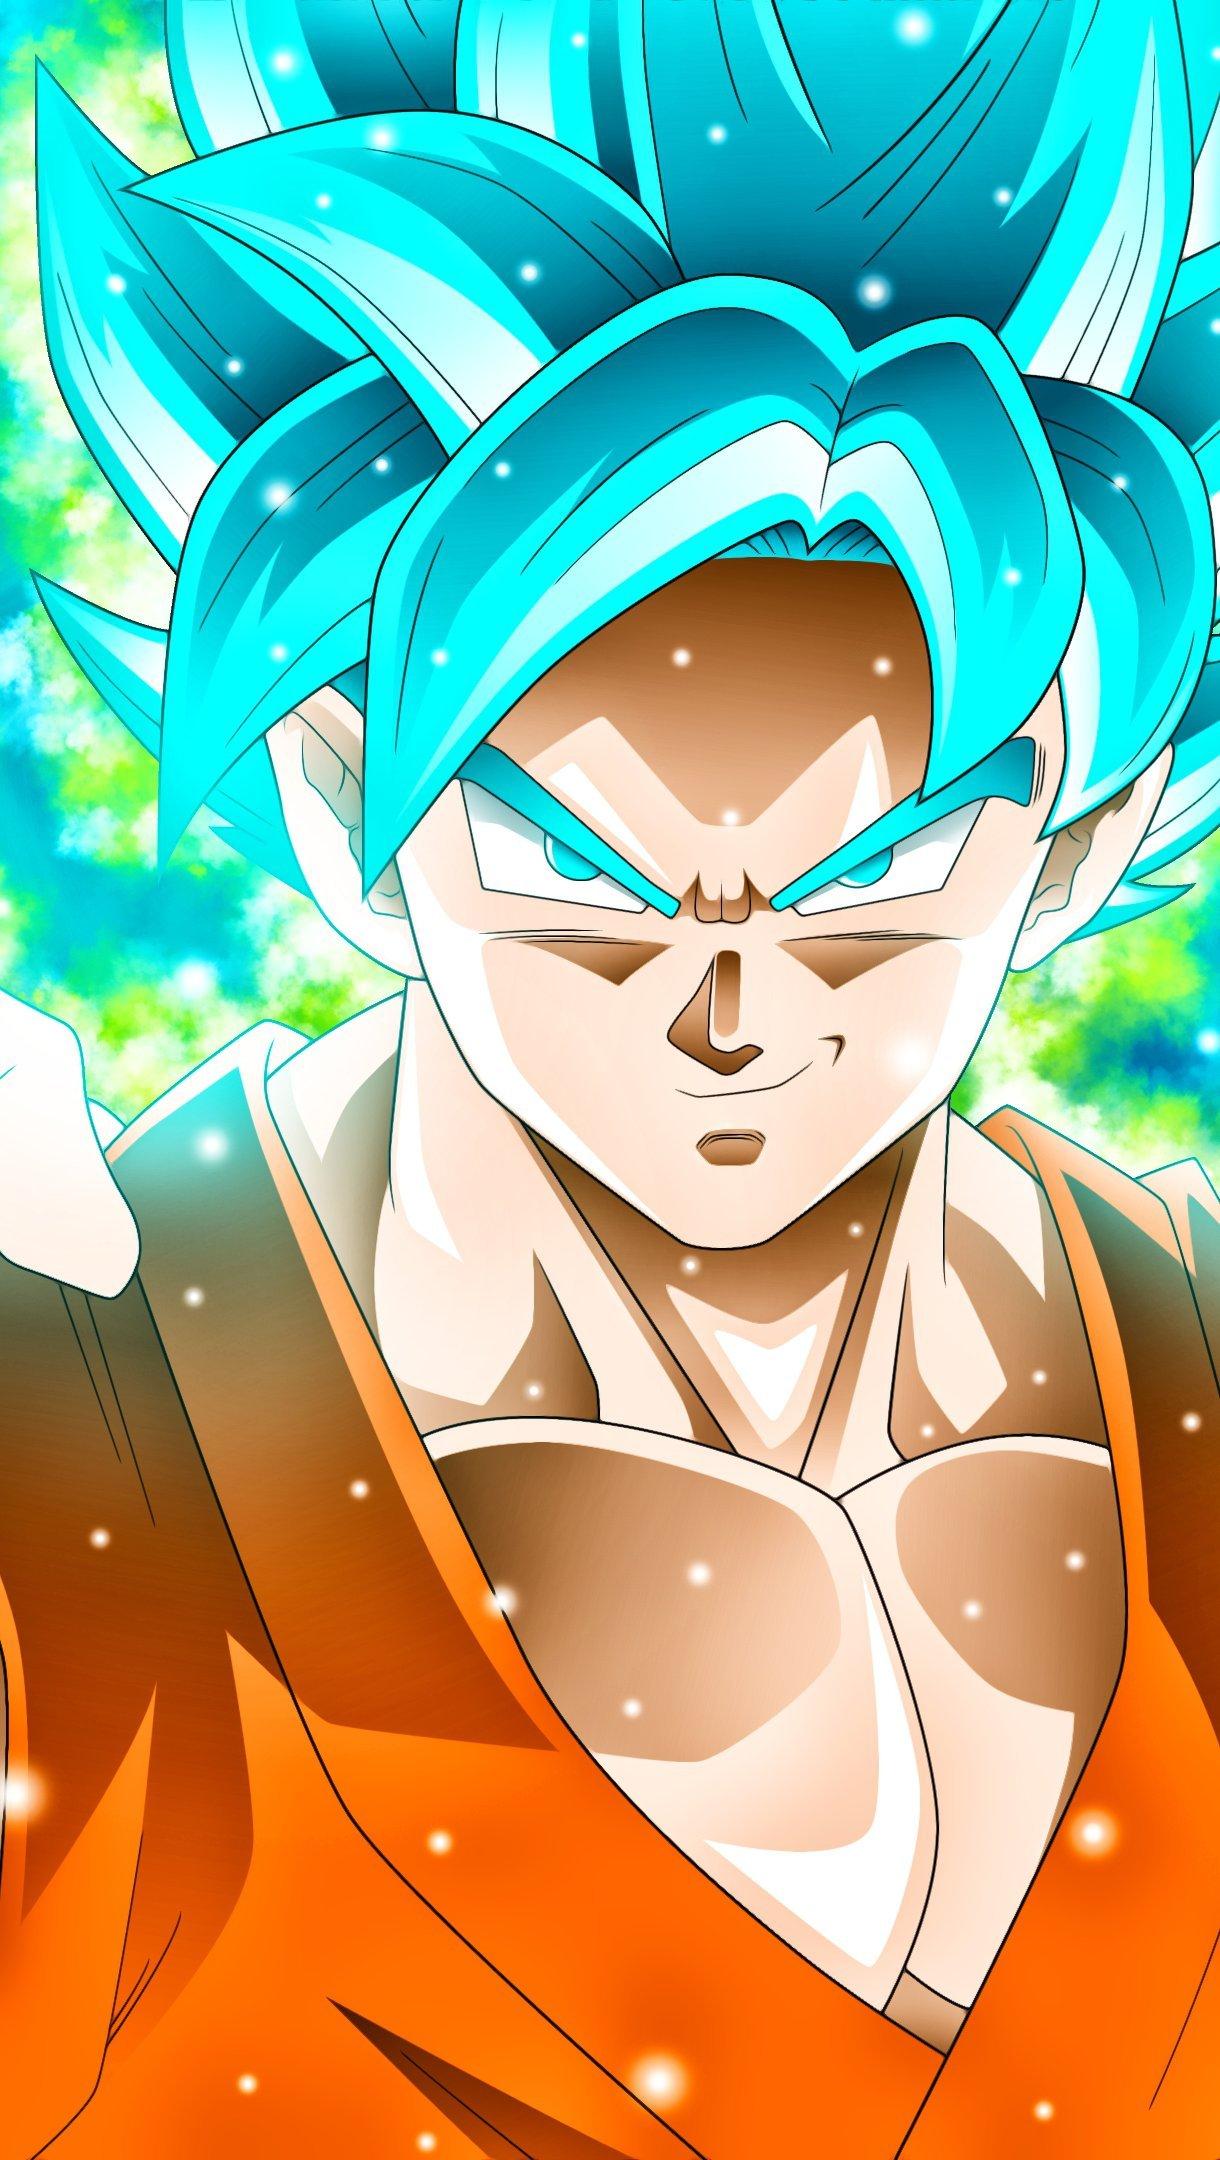 Anime Wallpaper Goku Super Saiyan Blue Dragon Ball Super Vertical